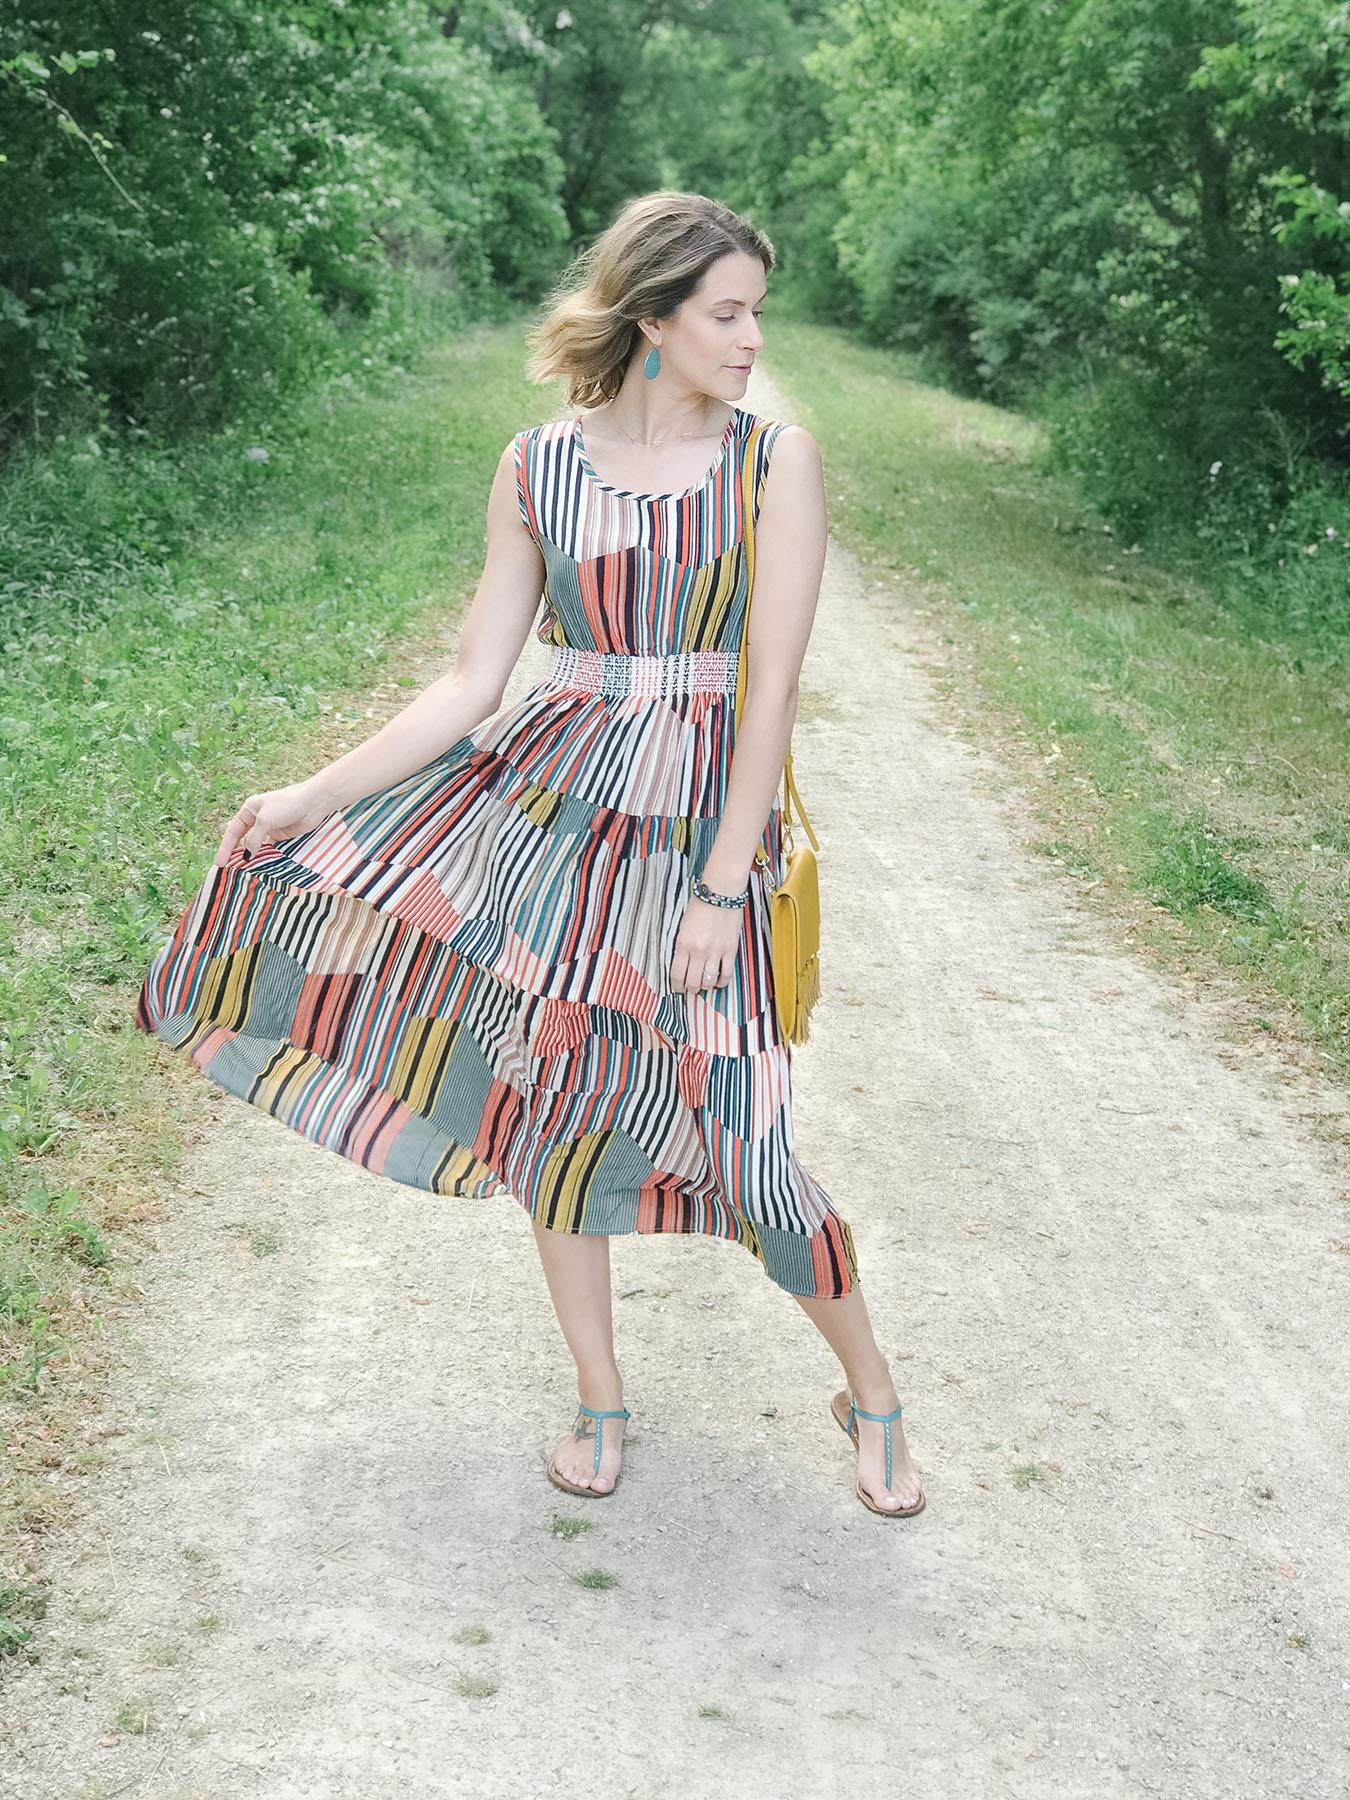 Boho dress style